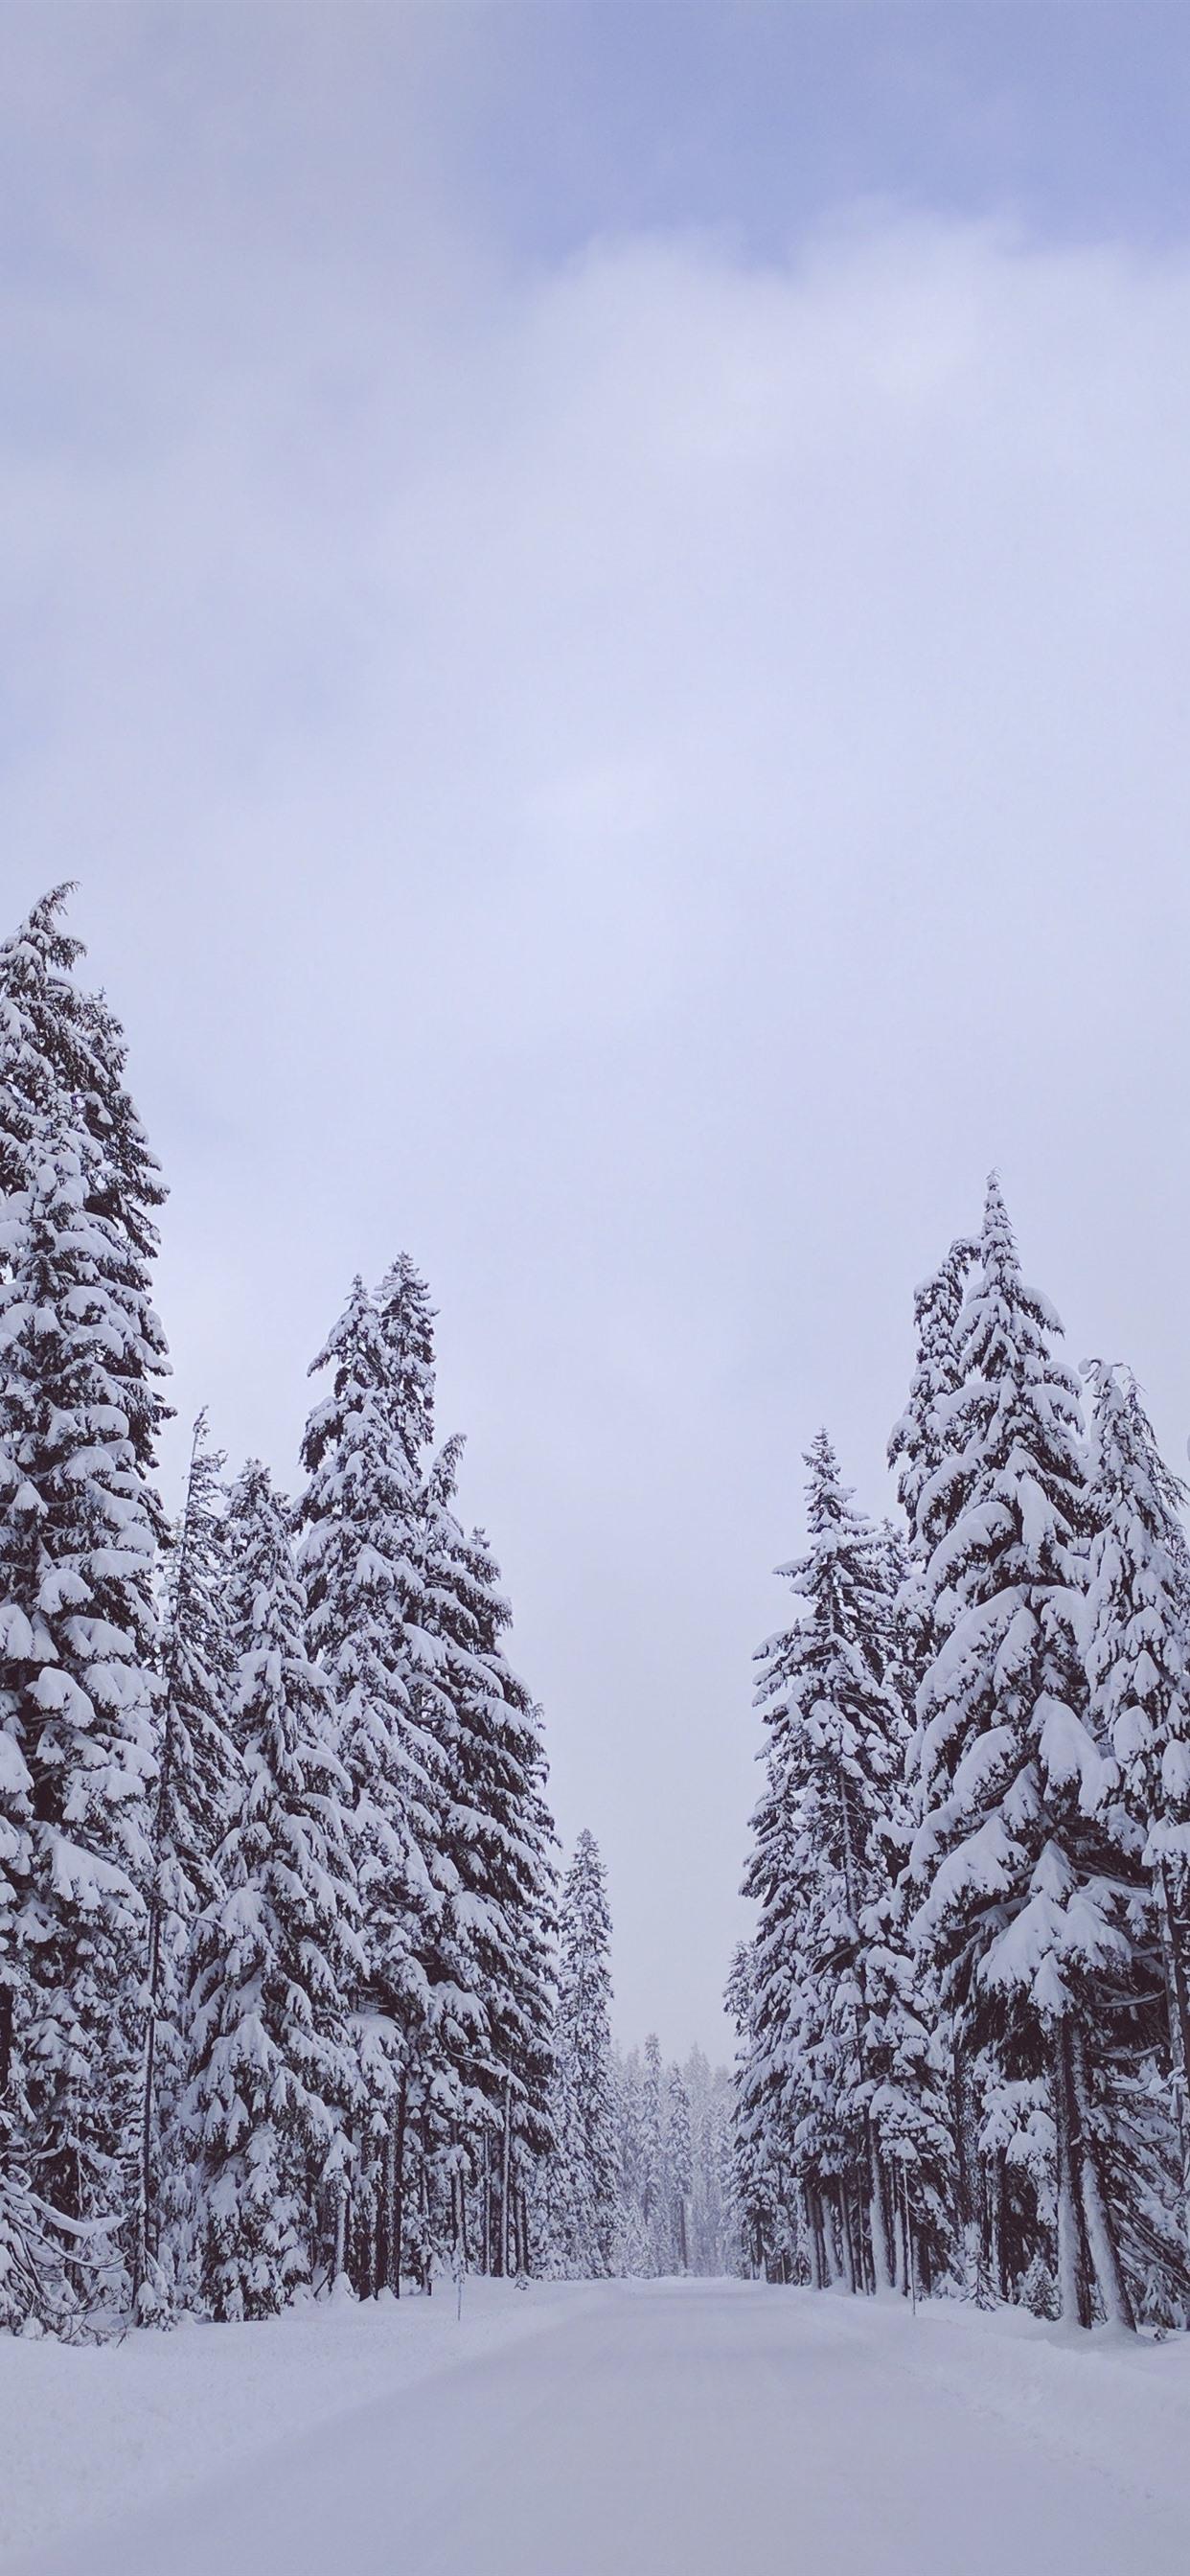 Trees White Snow Winter 1242x2688 Iphone Xs Max Wallpaper